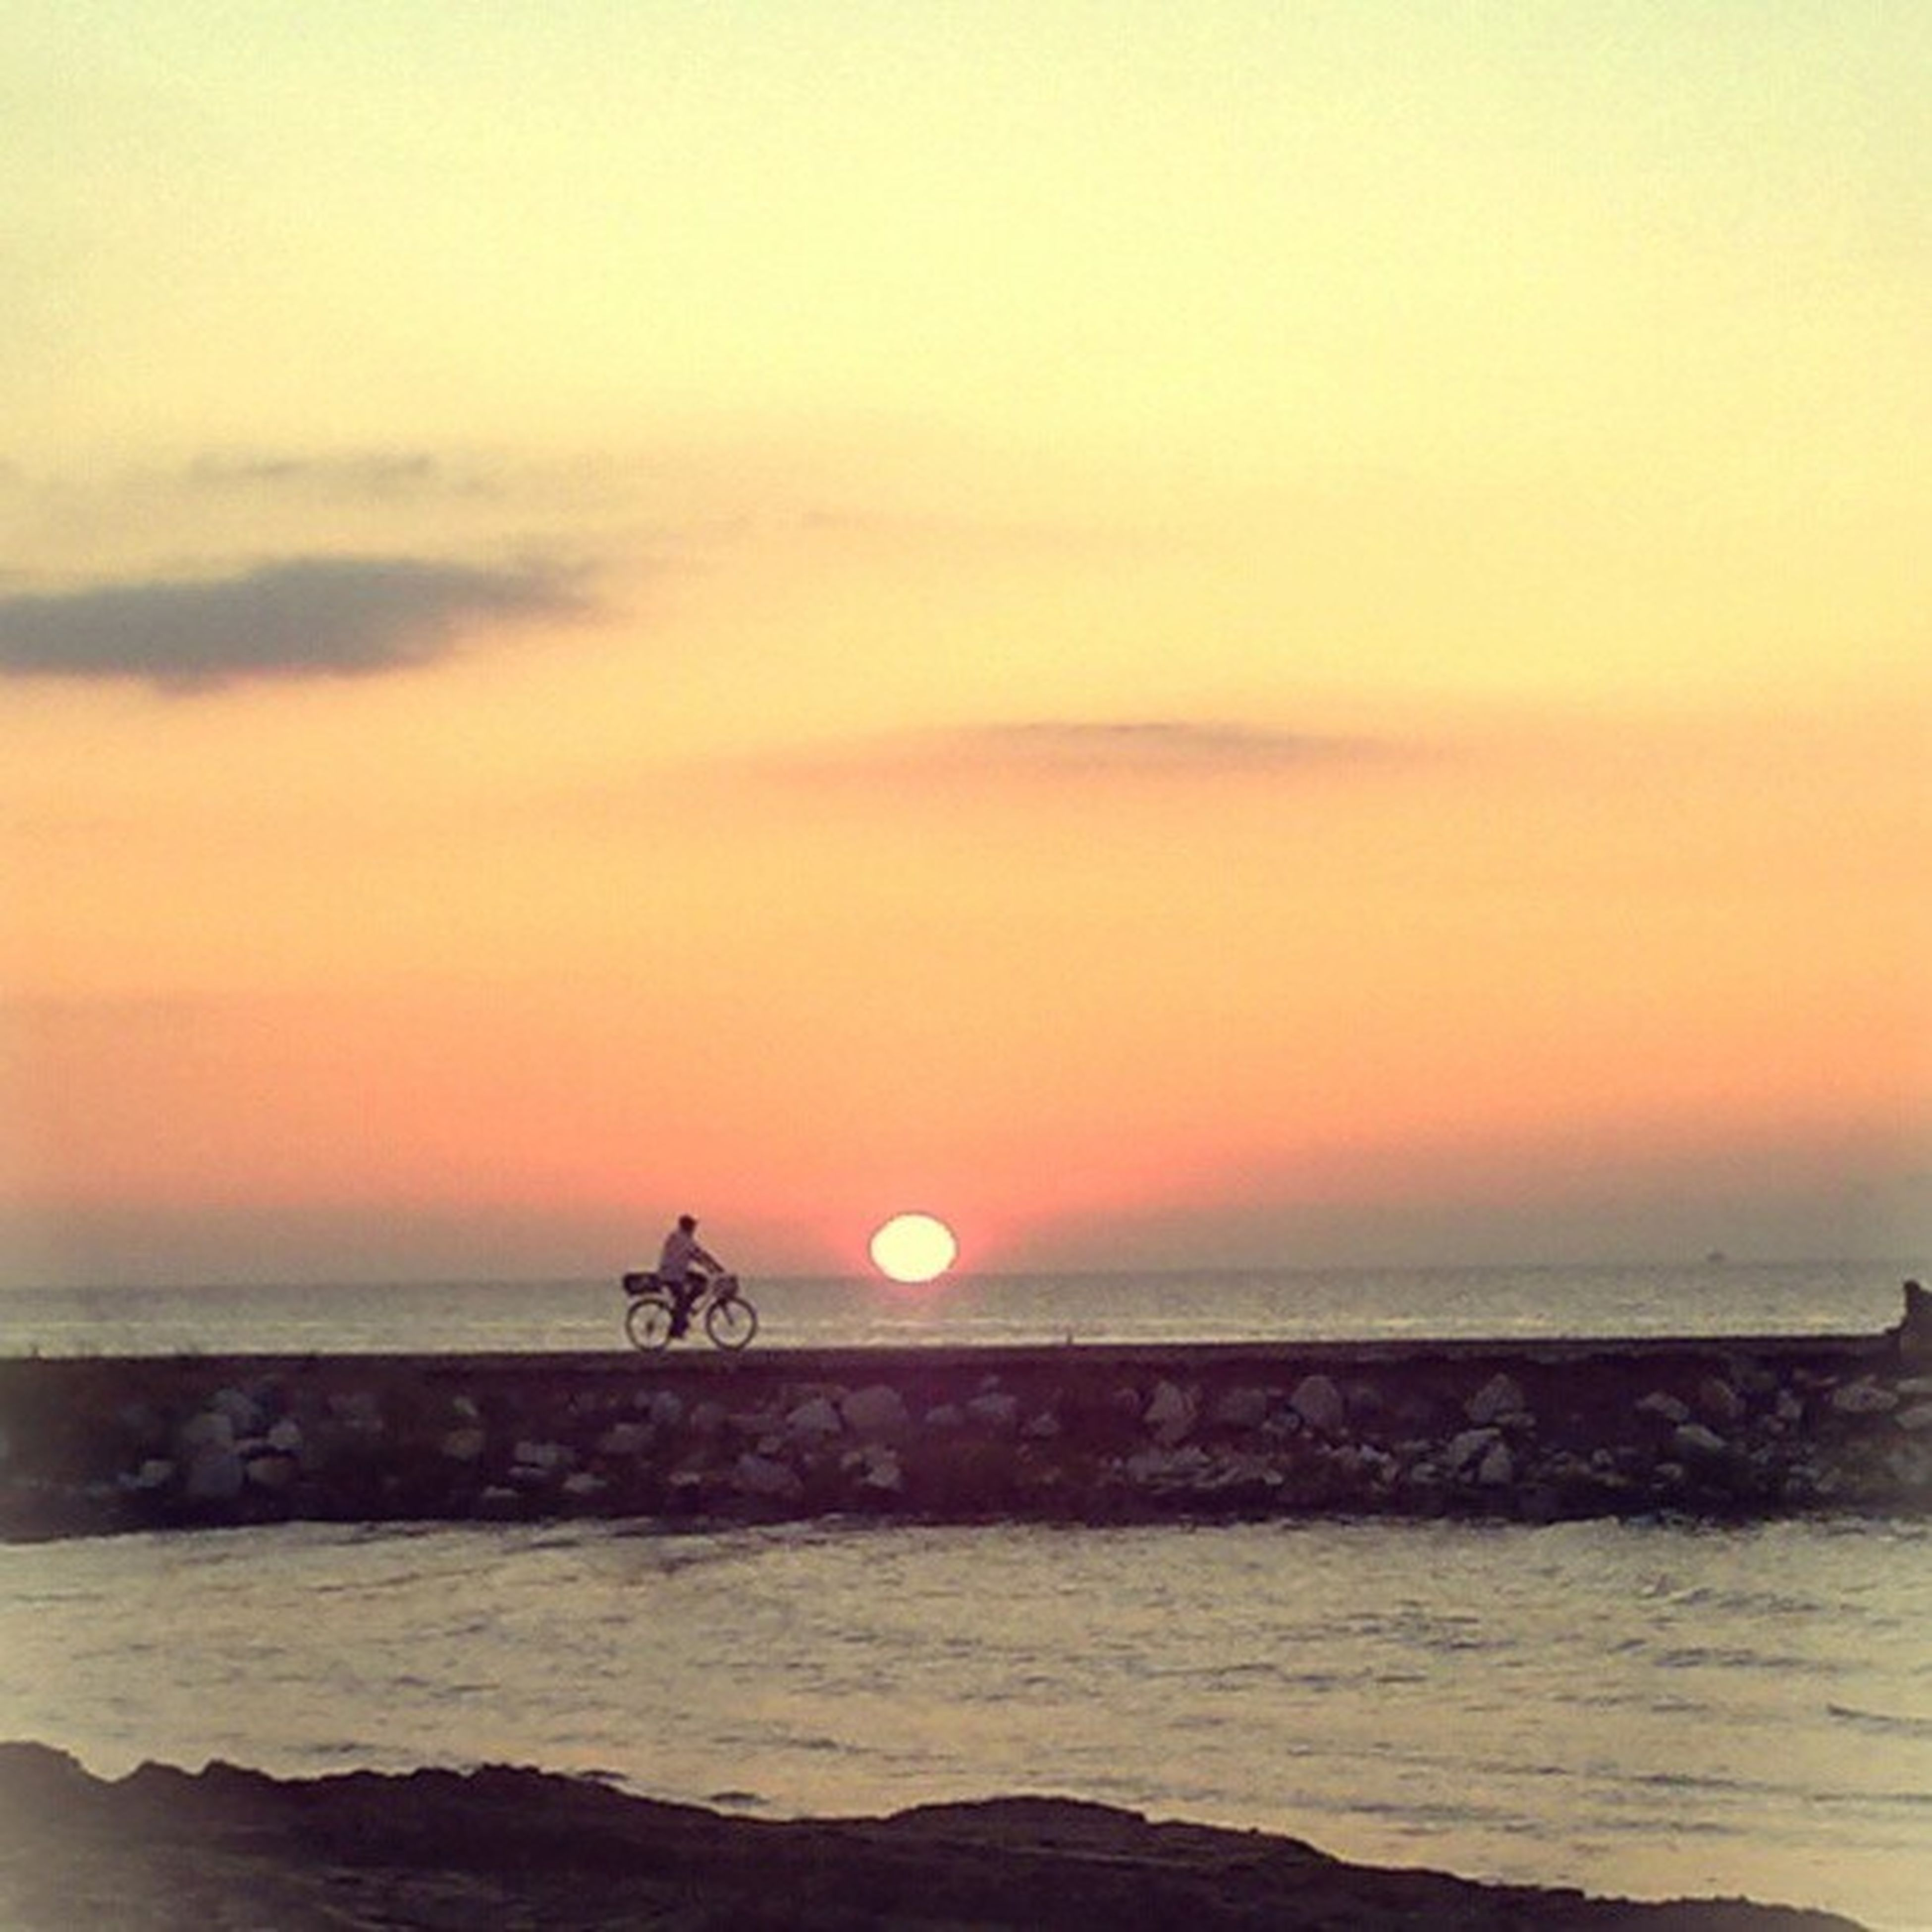 sunset, sea, horizon over water, water, orange color, scenics, sun, beauty in nature, sky, beach, tranquil scene, silhouette, leisure activity, tranquility, lifestyles, idyllic, men, nature